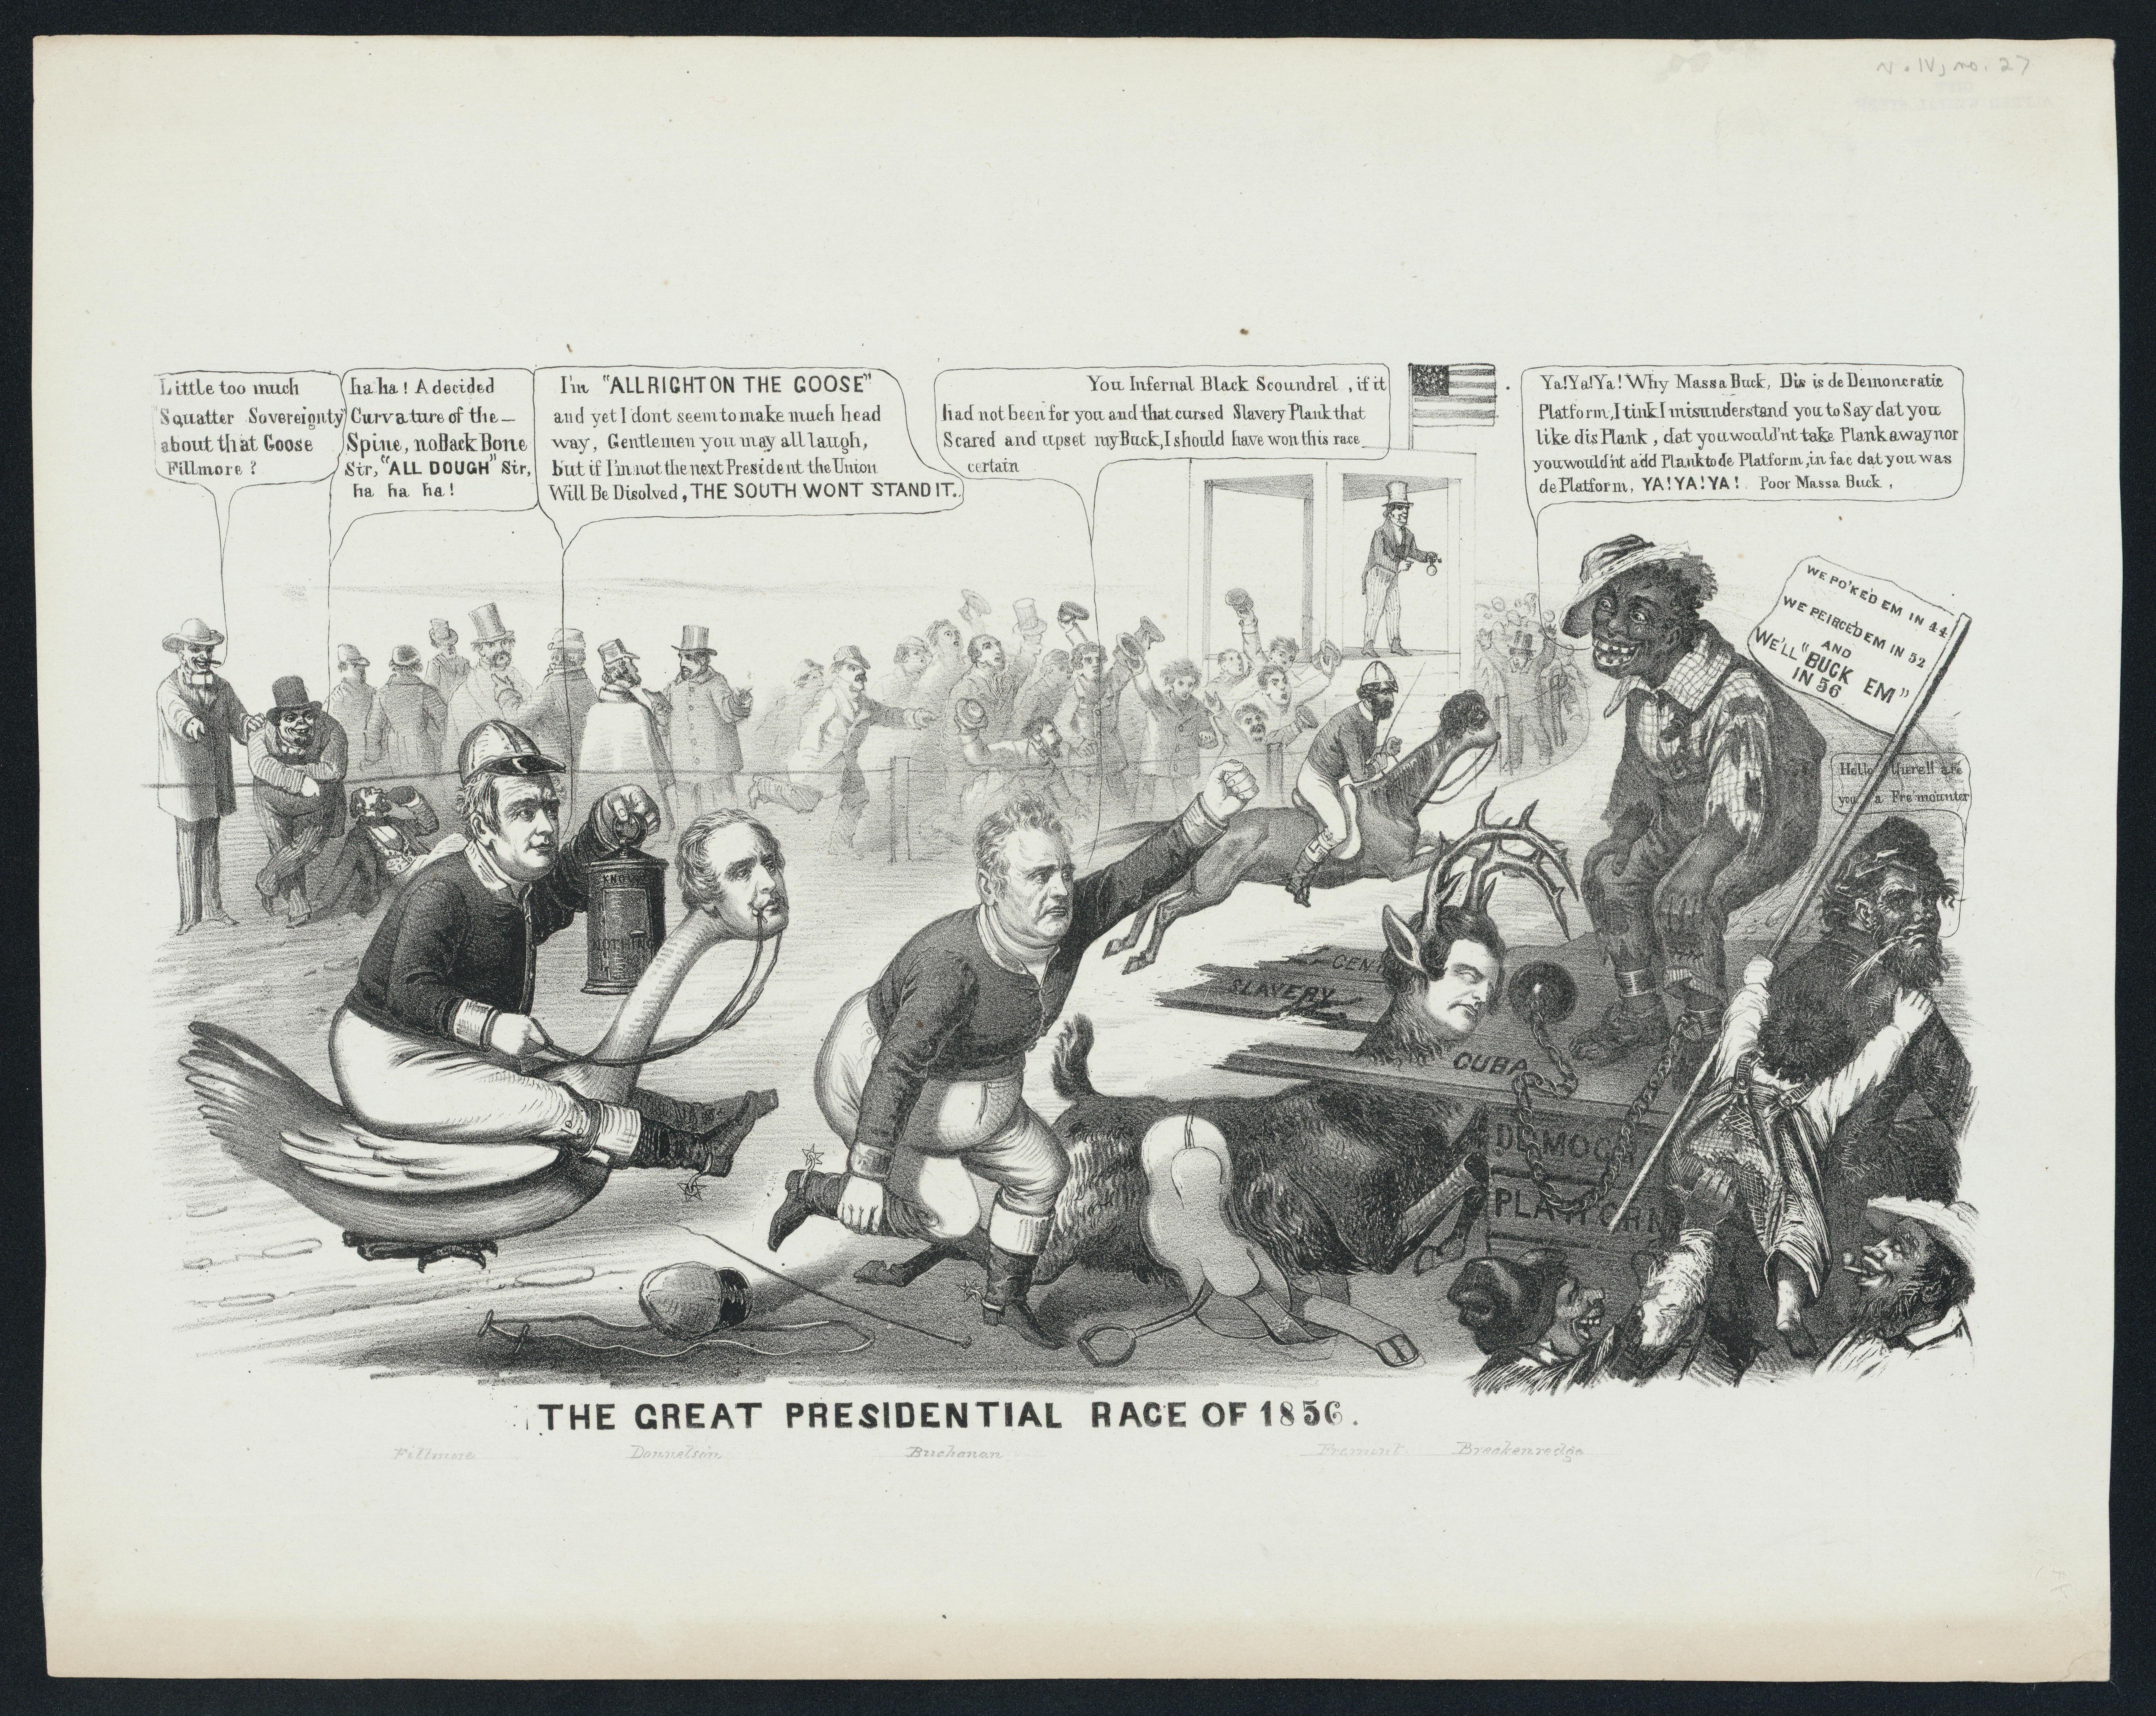 Millard Fillmore In Cartoons The Great Presidential Race